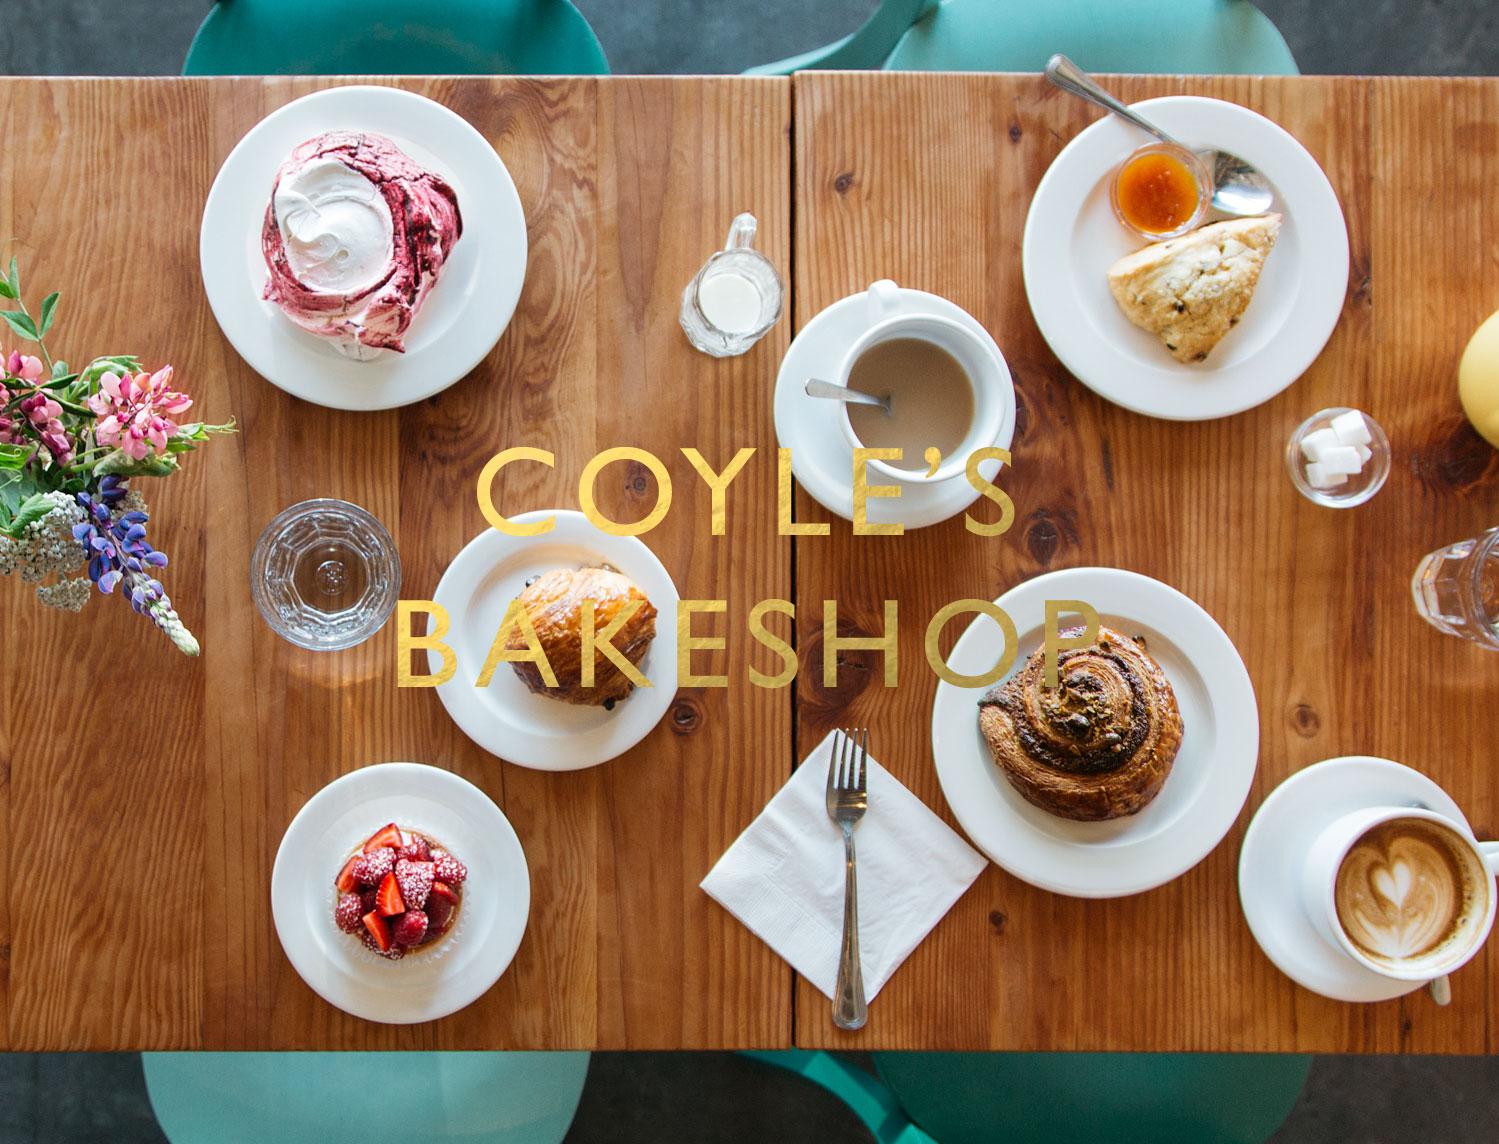 Coyle's Bakeshop Welcome